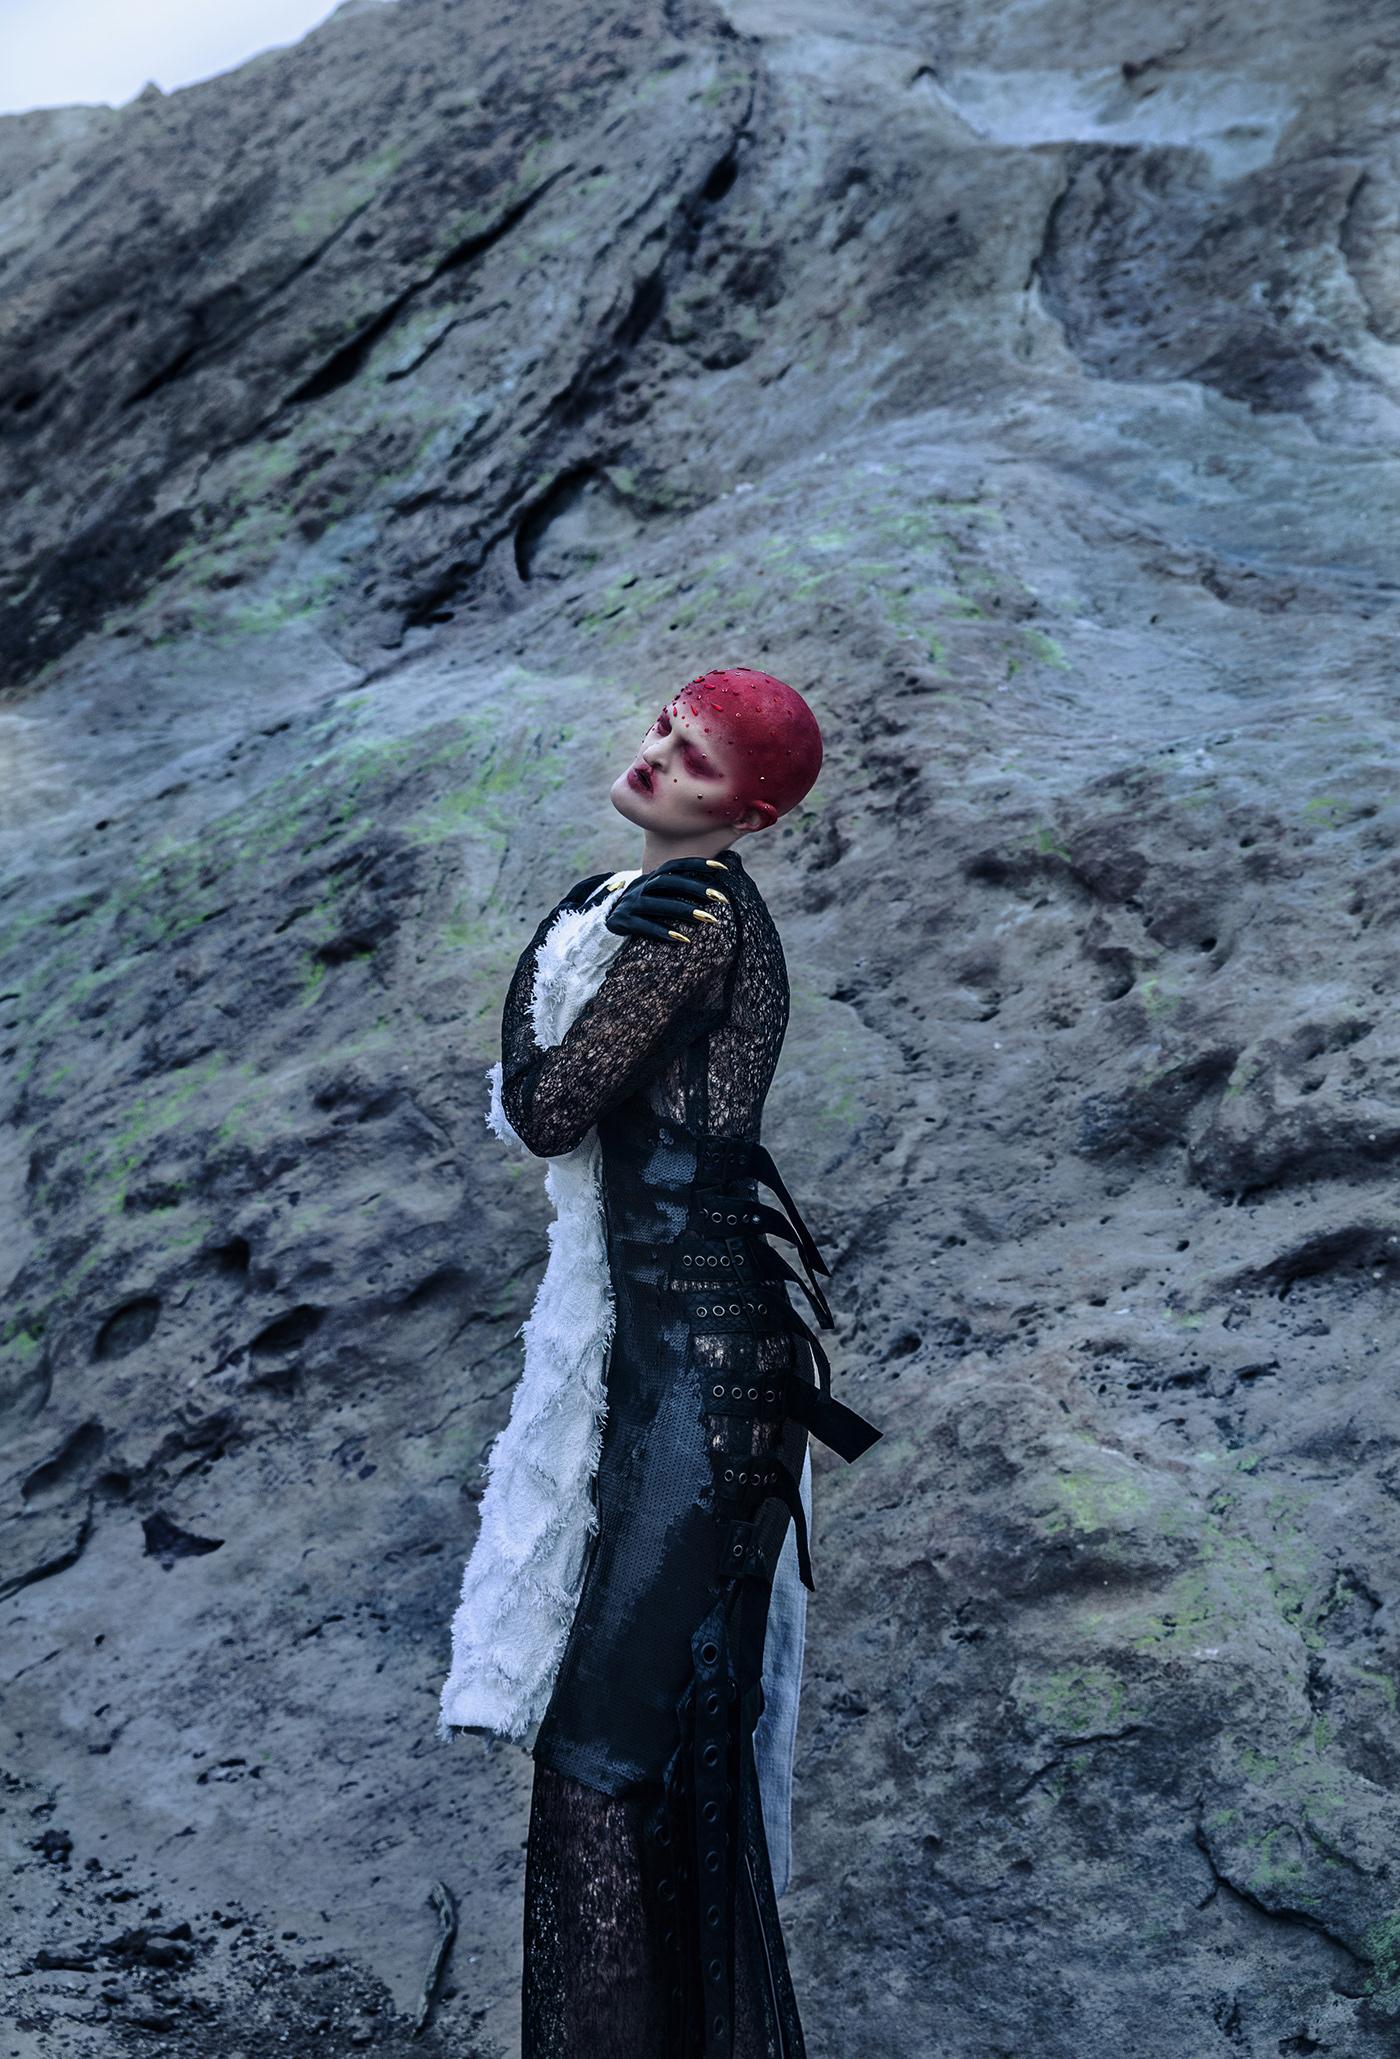 Land of silent для Virtuogenix magazine / фото Ekaterina Belinskaya - модель Melanie Gaydos